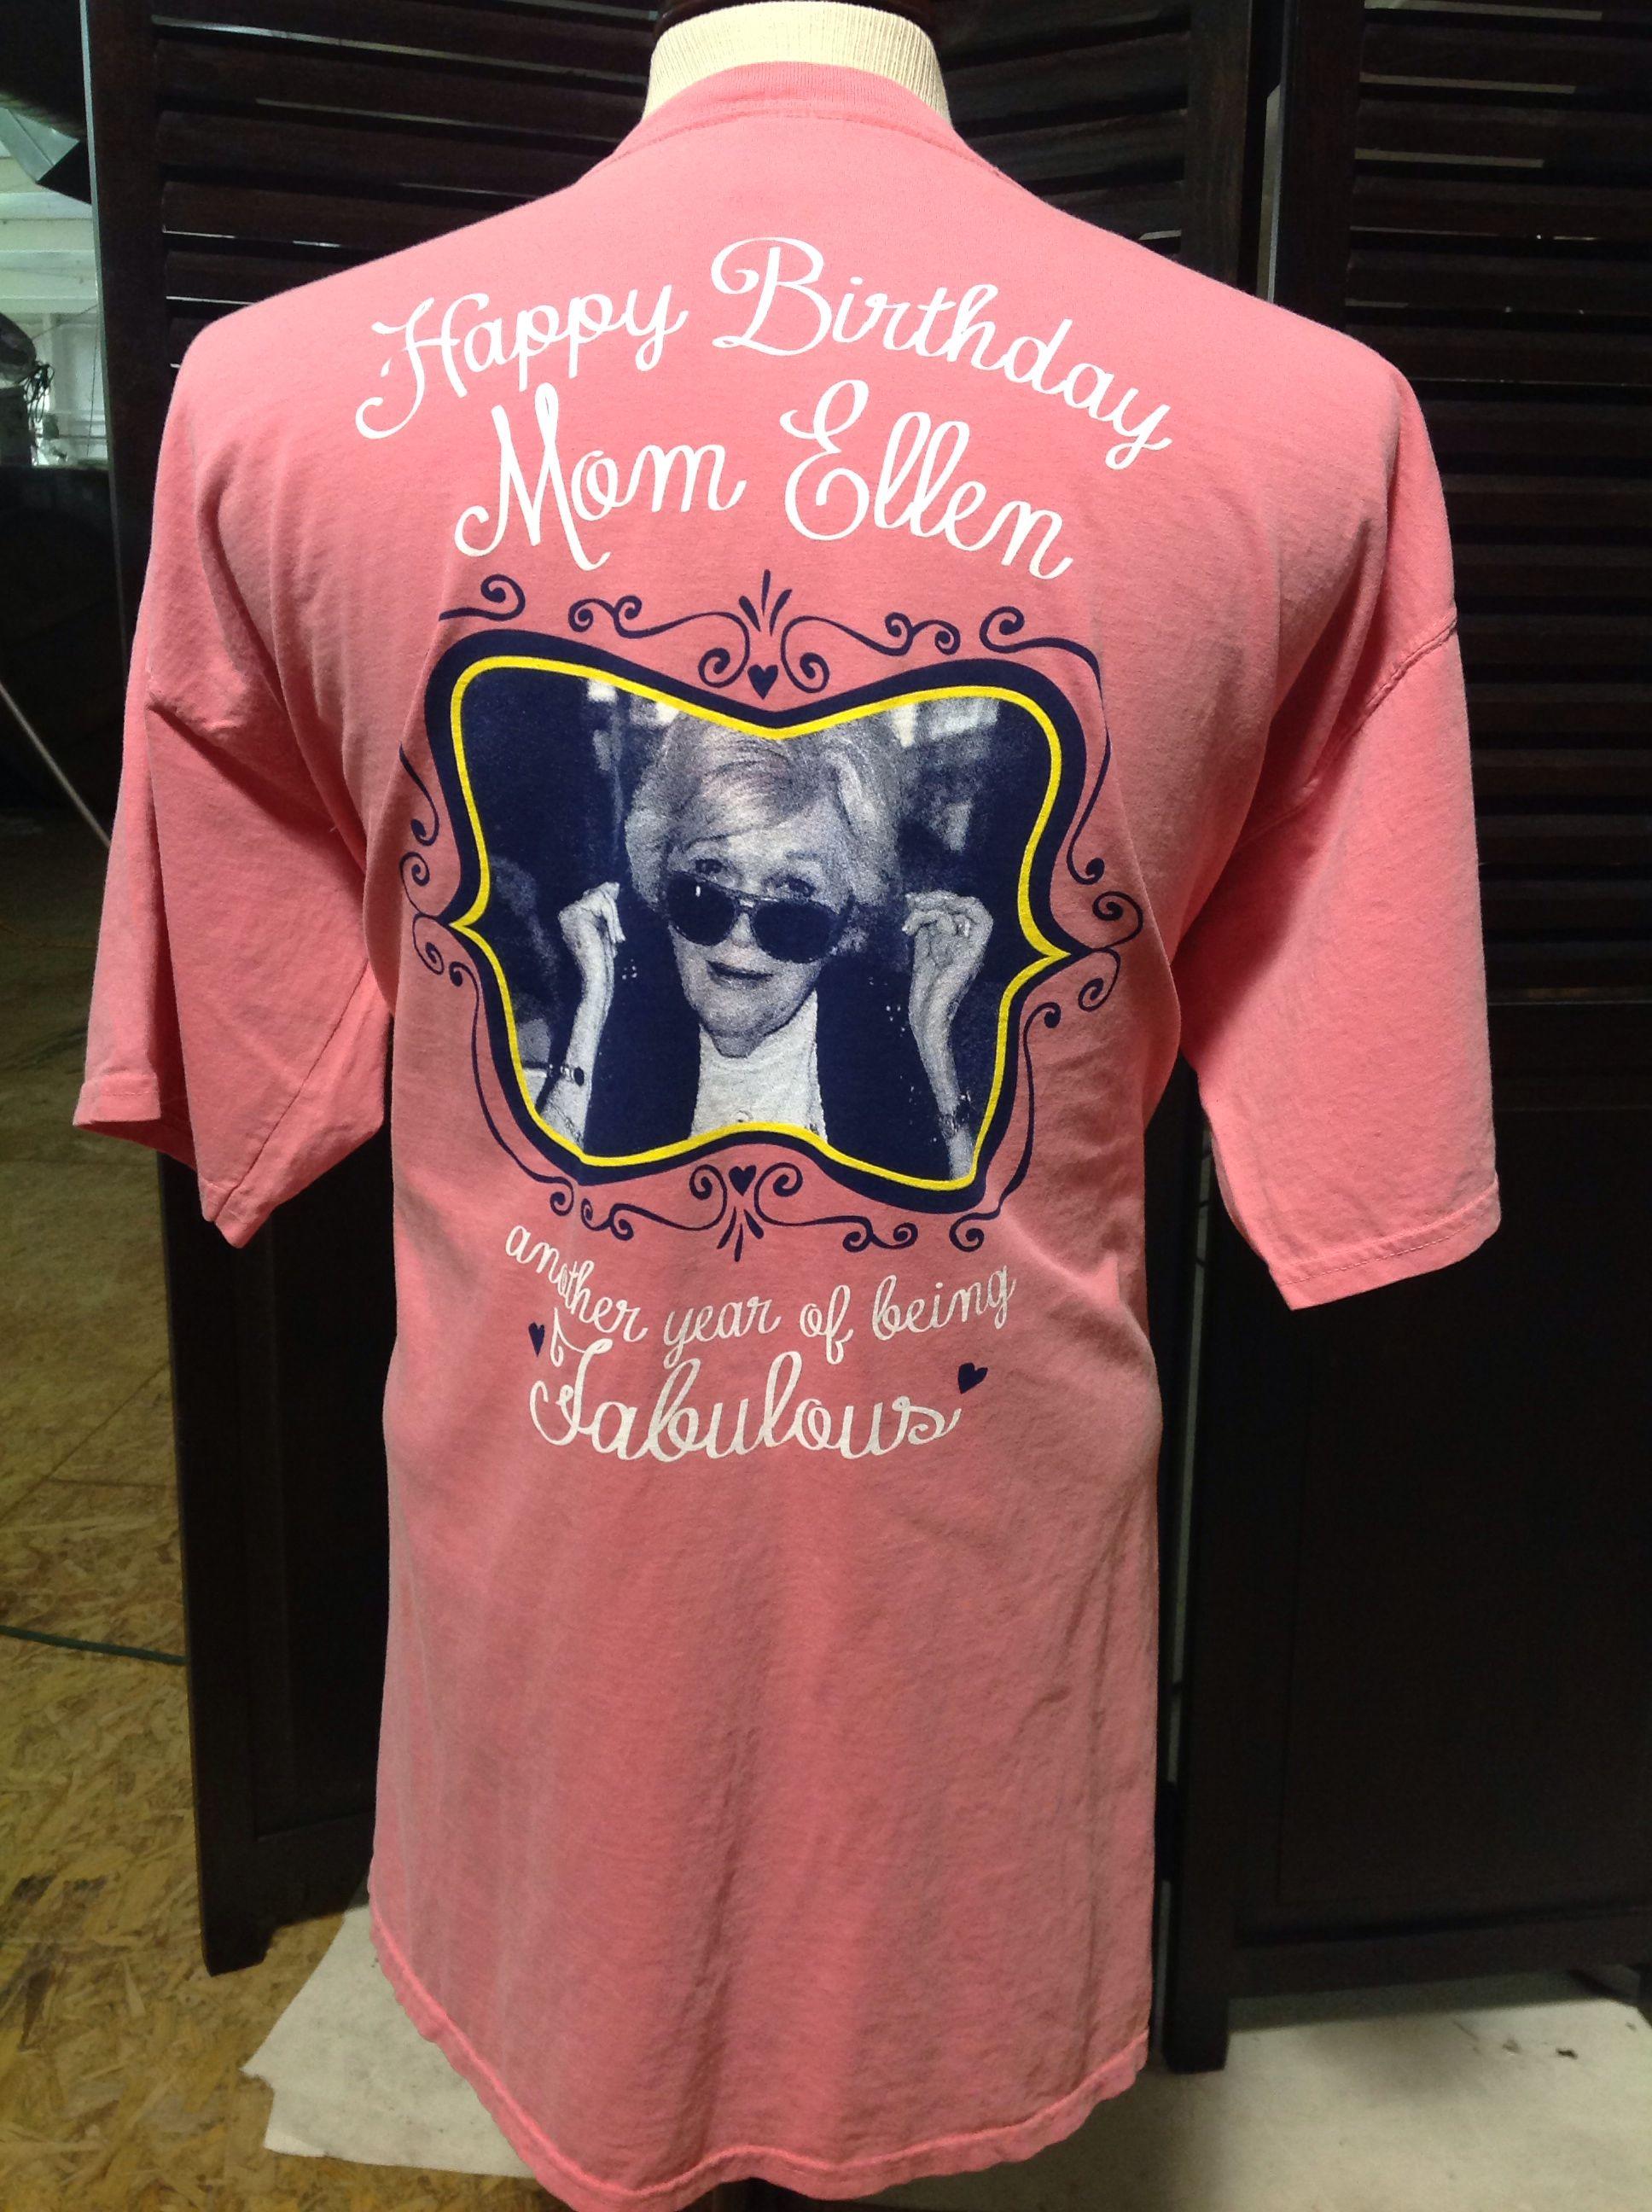 University Of Arkansas Tri Delta Happy Birthday Mom Ellen Comfort Colors T Shirt TriDelta TriDelt DeltaDeltaDelta ComfortColors GreekLife